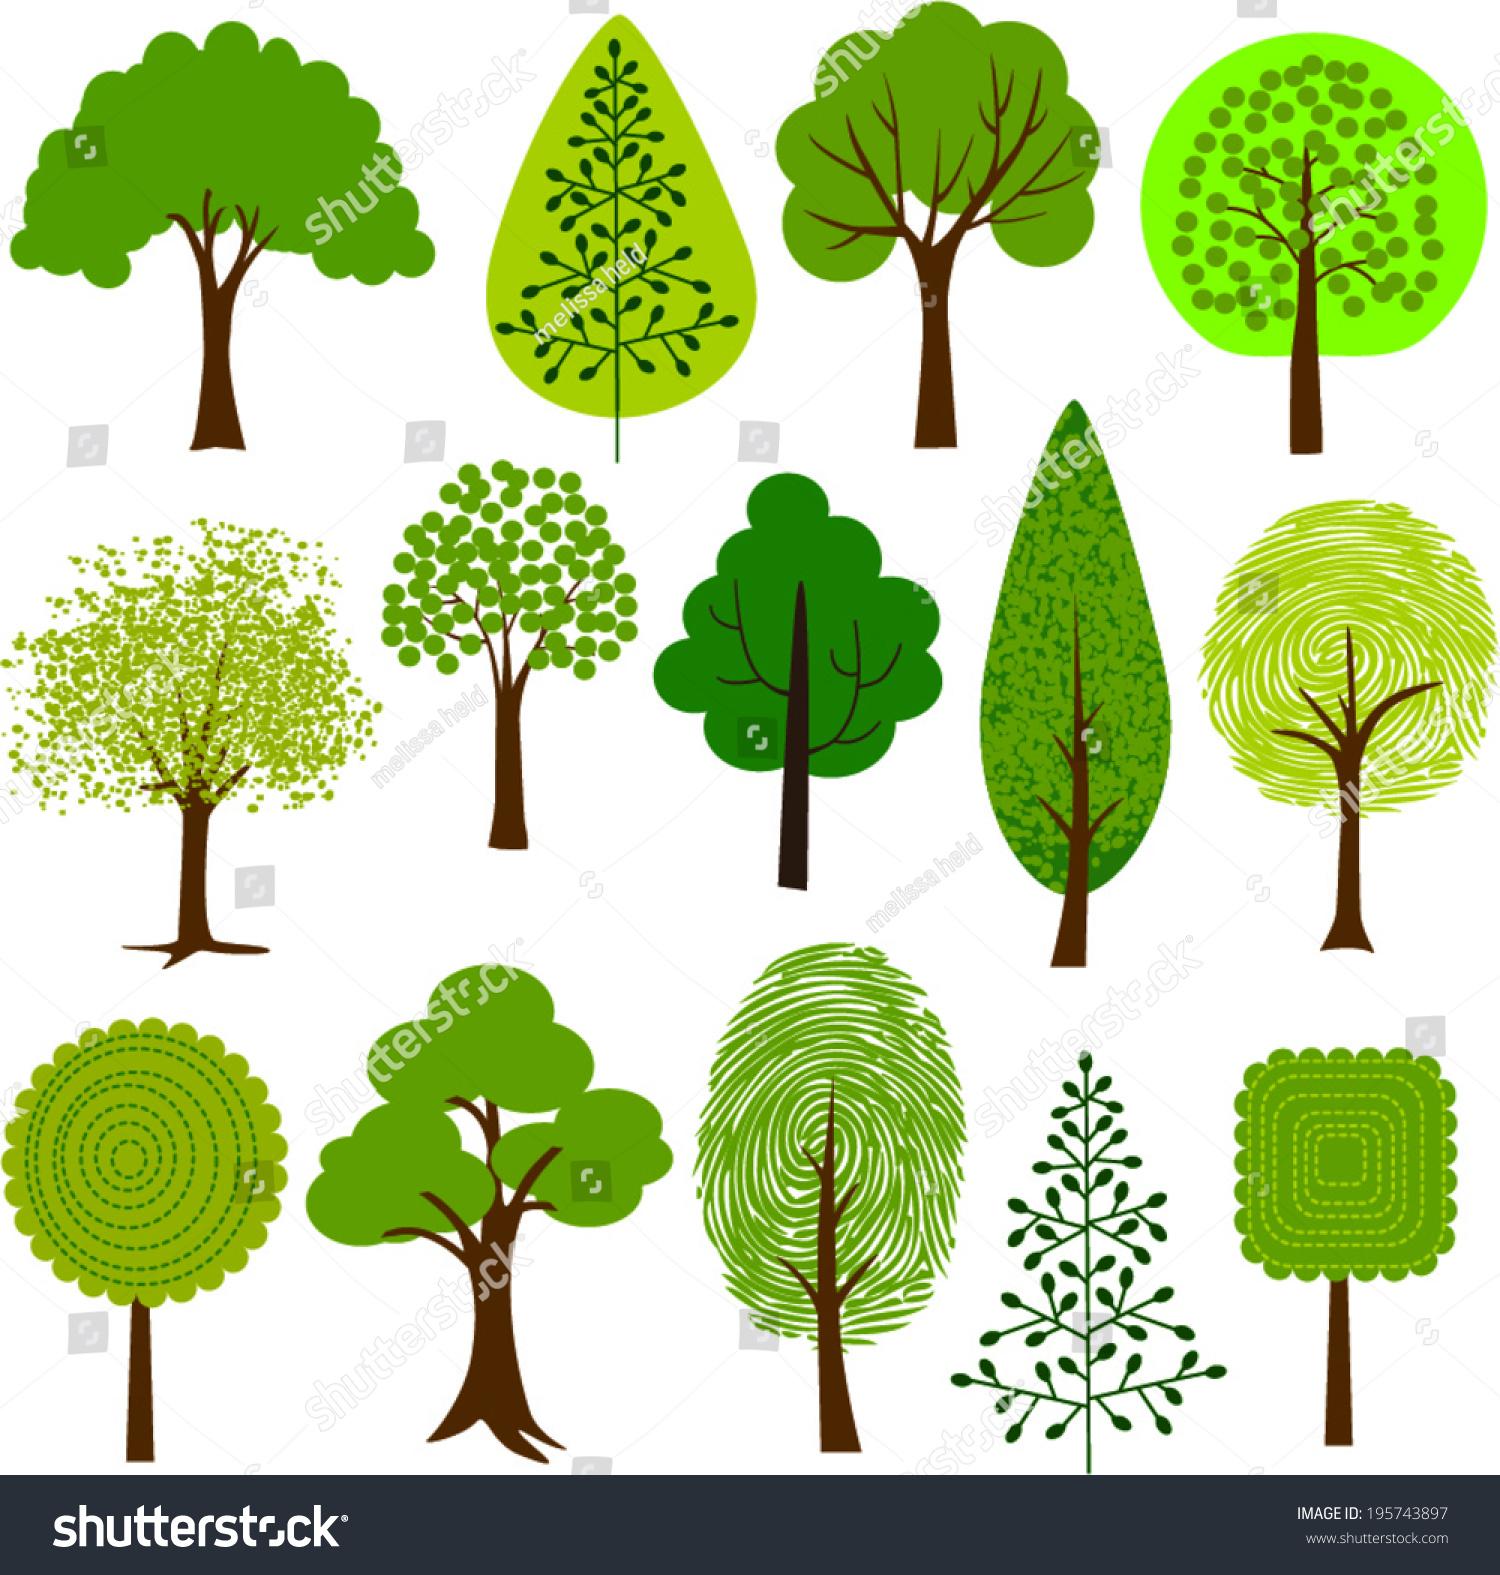 free clipart decision tree - photo #26